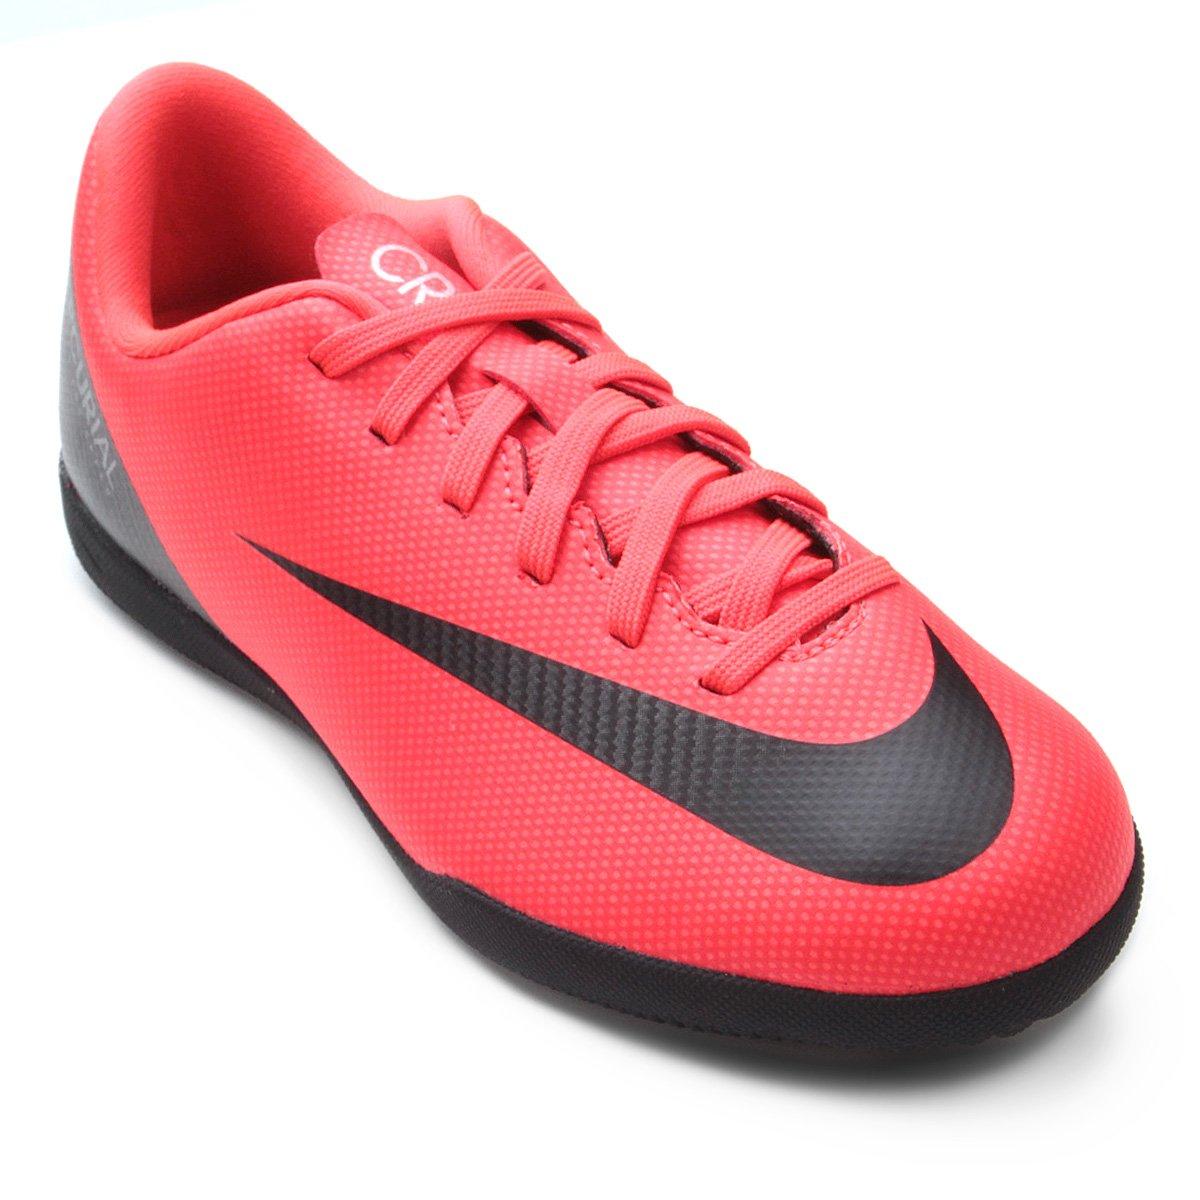 920365d398 Chuteira Futsal Infantil Nike Mercurial Vapor 12 Club GS CR7 IC ...